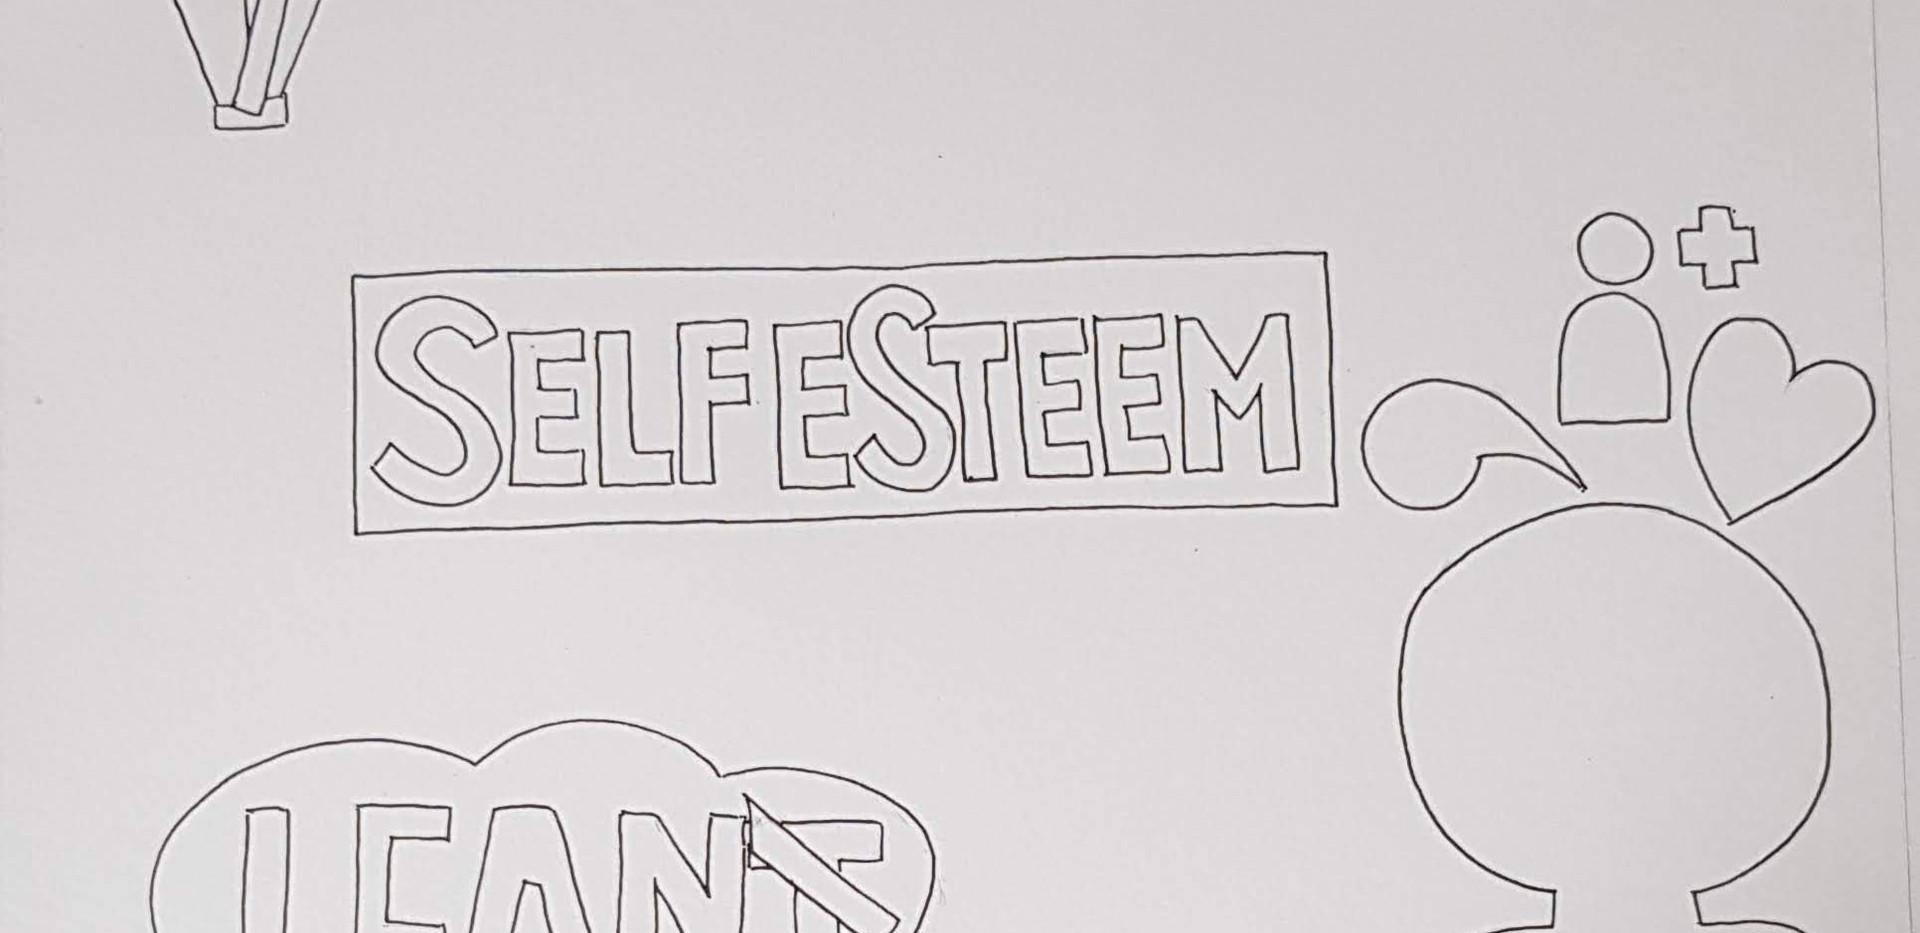 Self esteem colouring page design